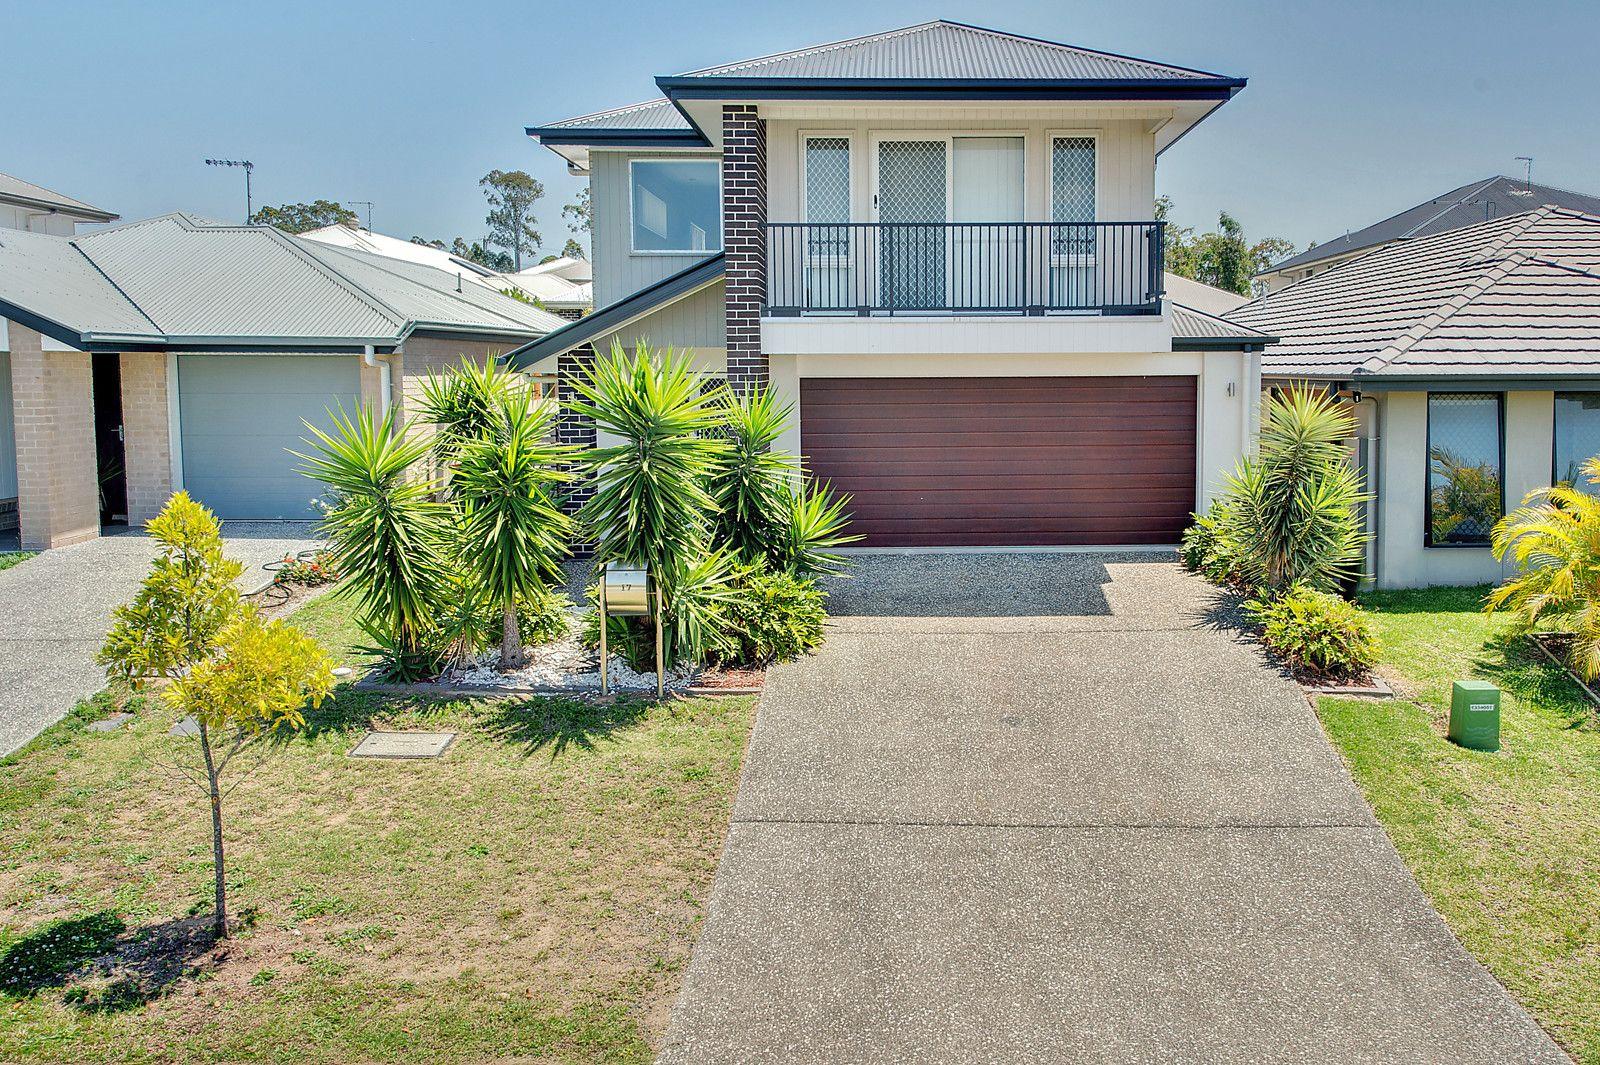 17 Stokes Street, North Lakes QLD 4509, Image 0